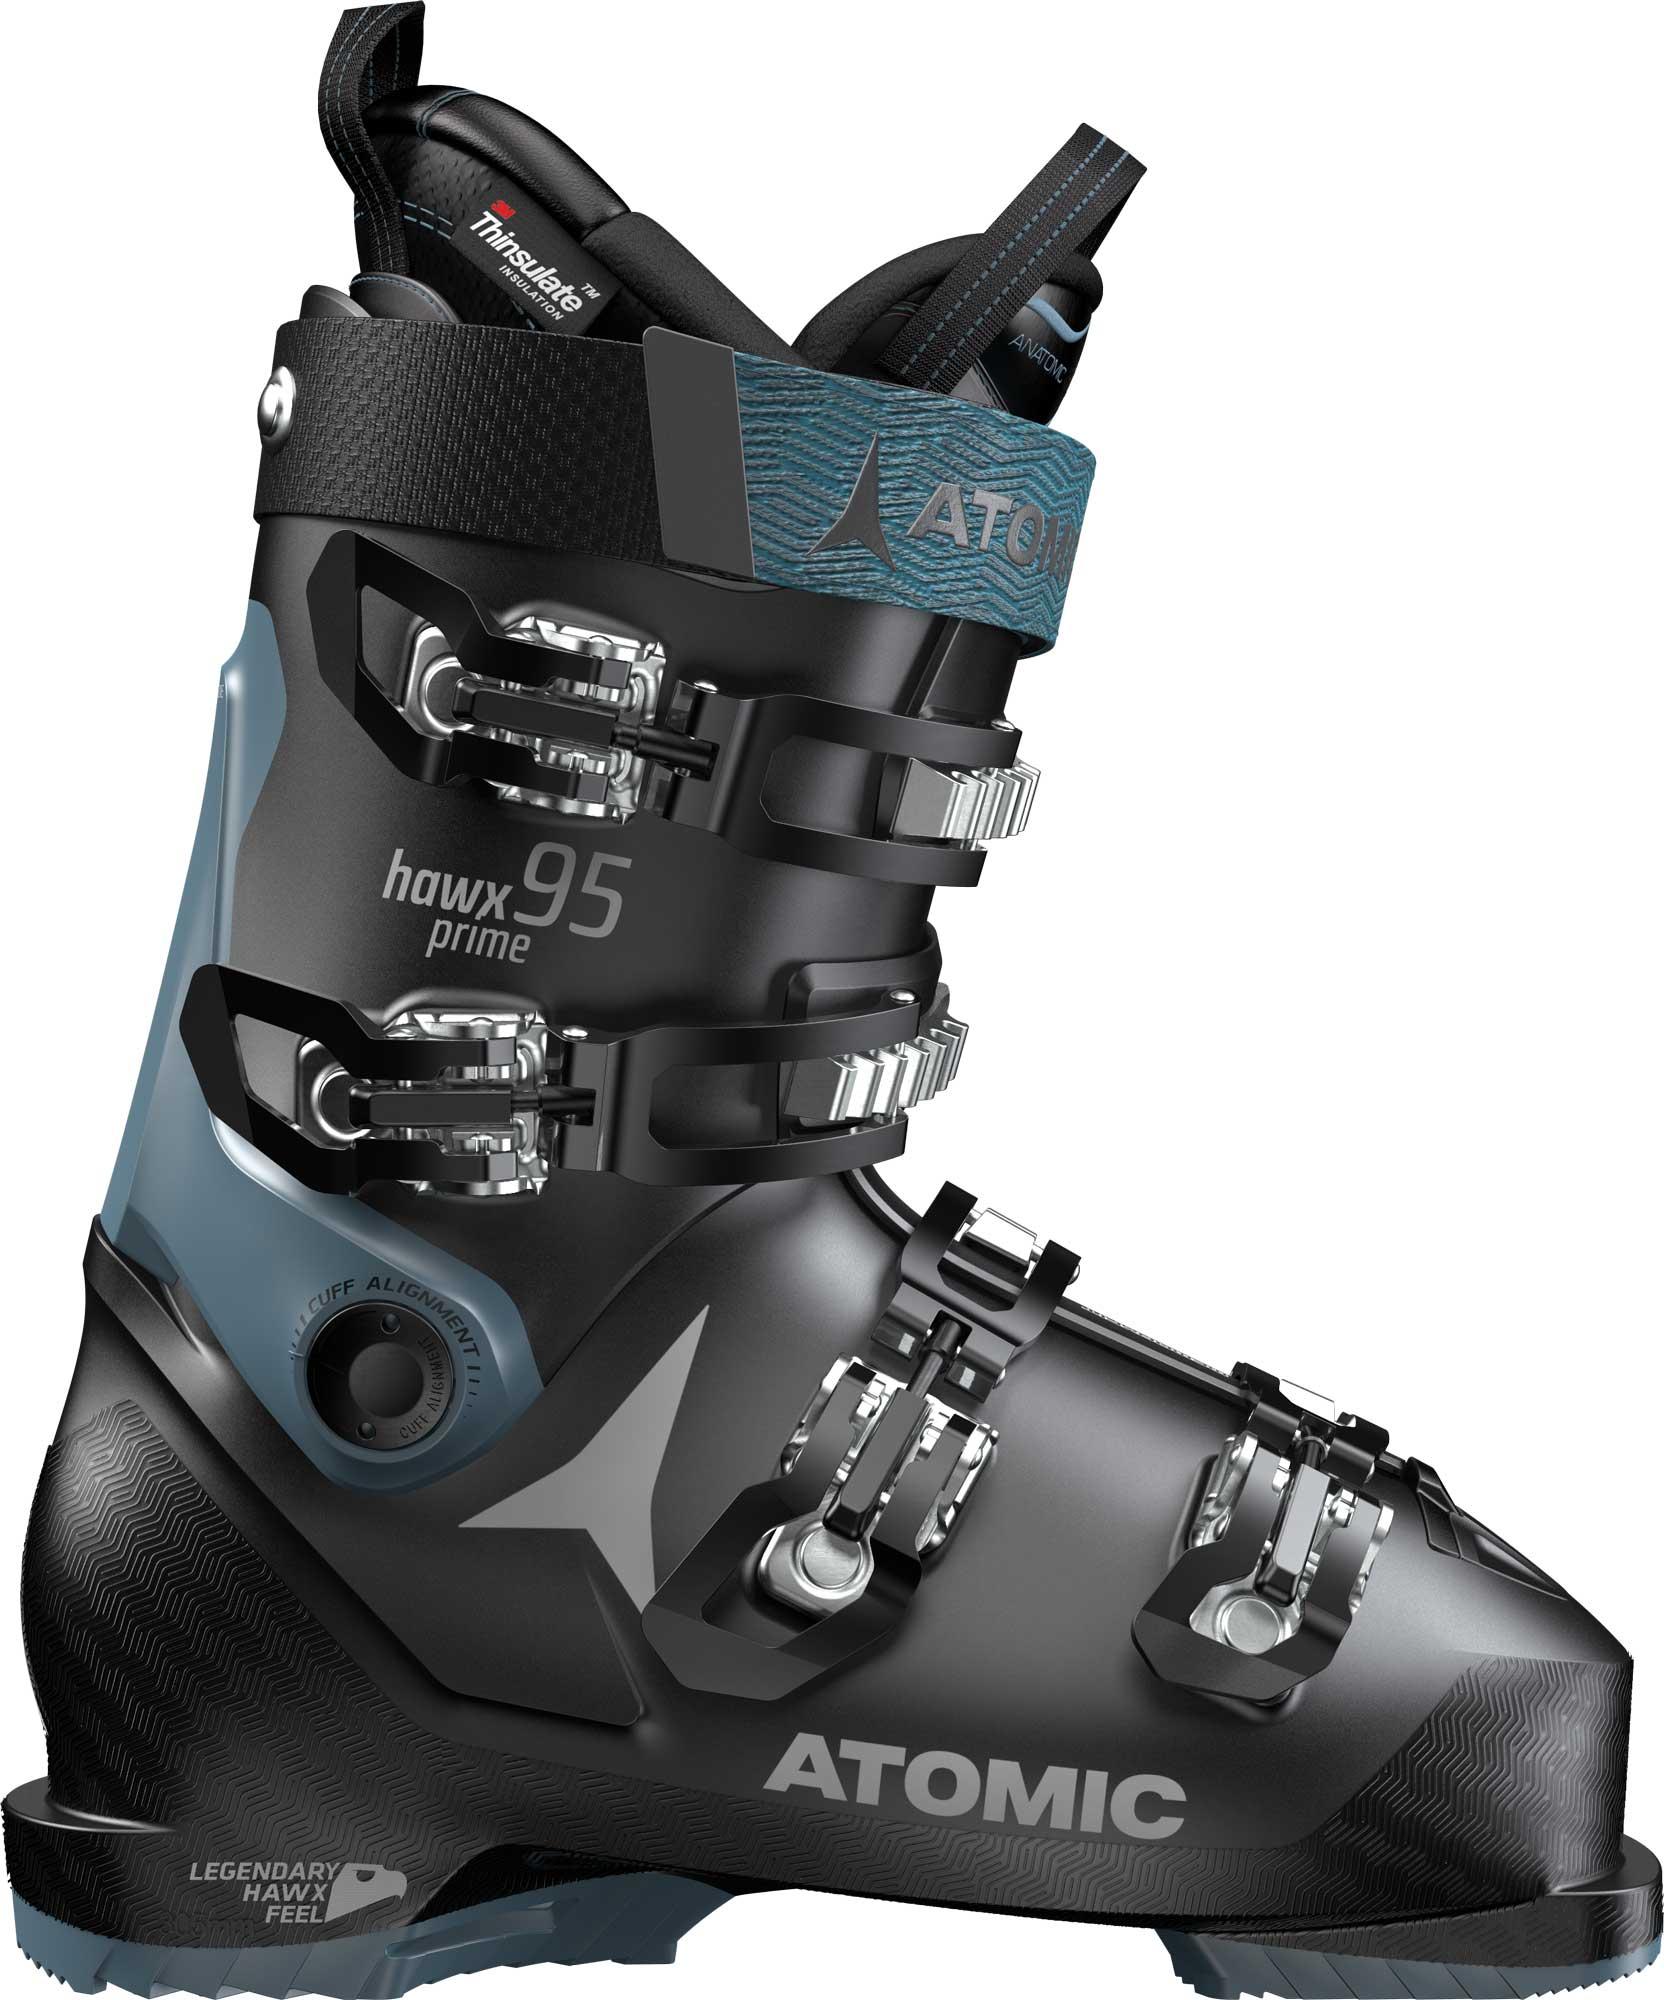 Atomic Hawx Prime 95 Women - black/denim blue (2019/20)